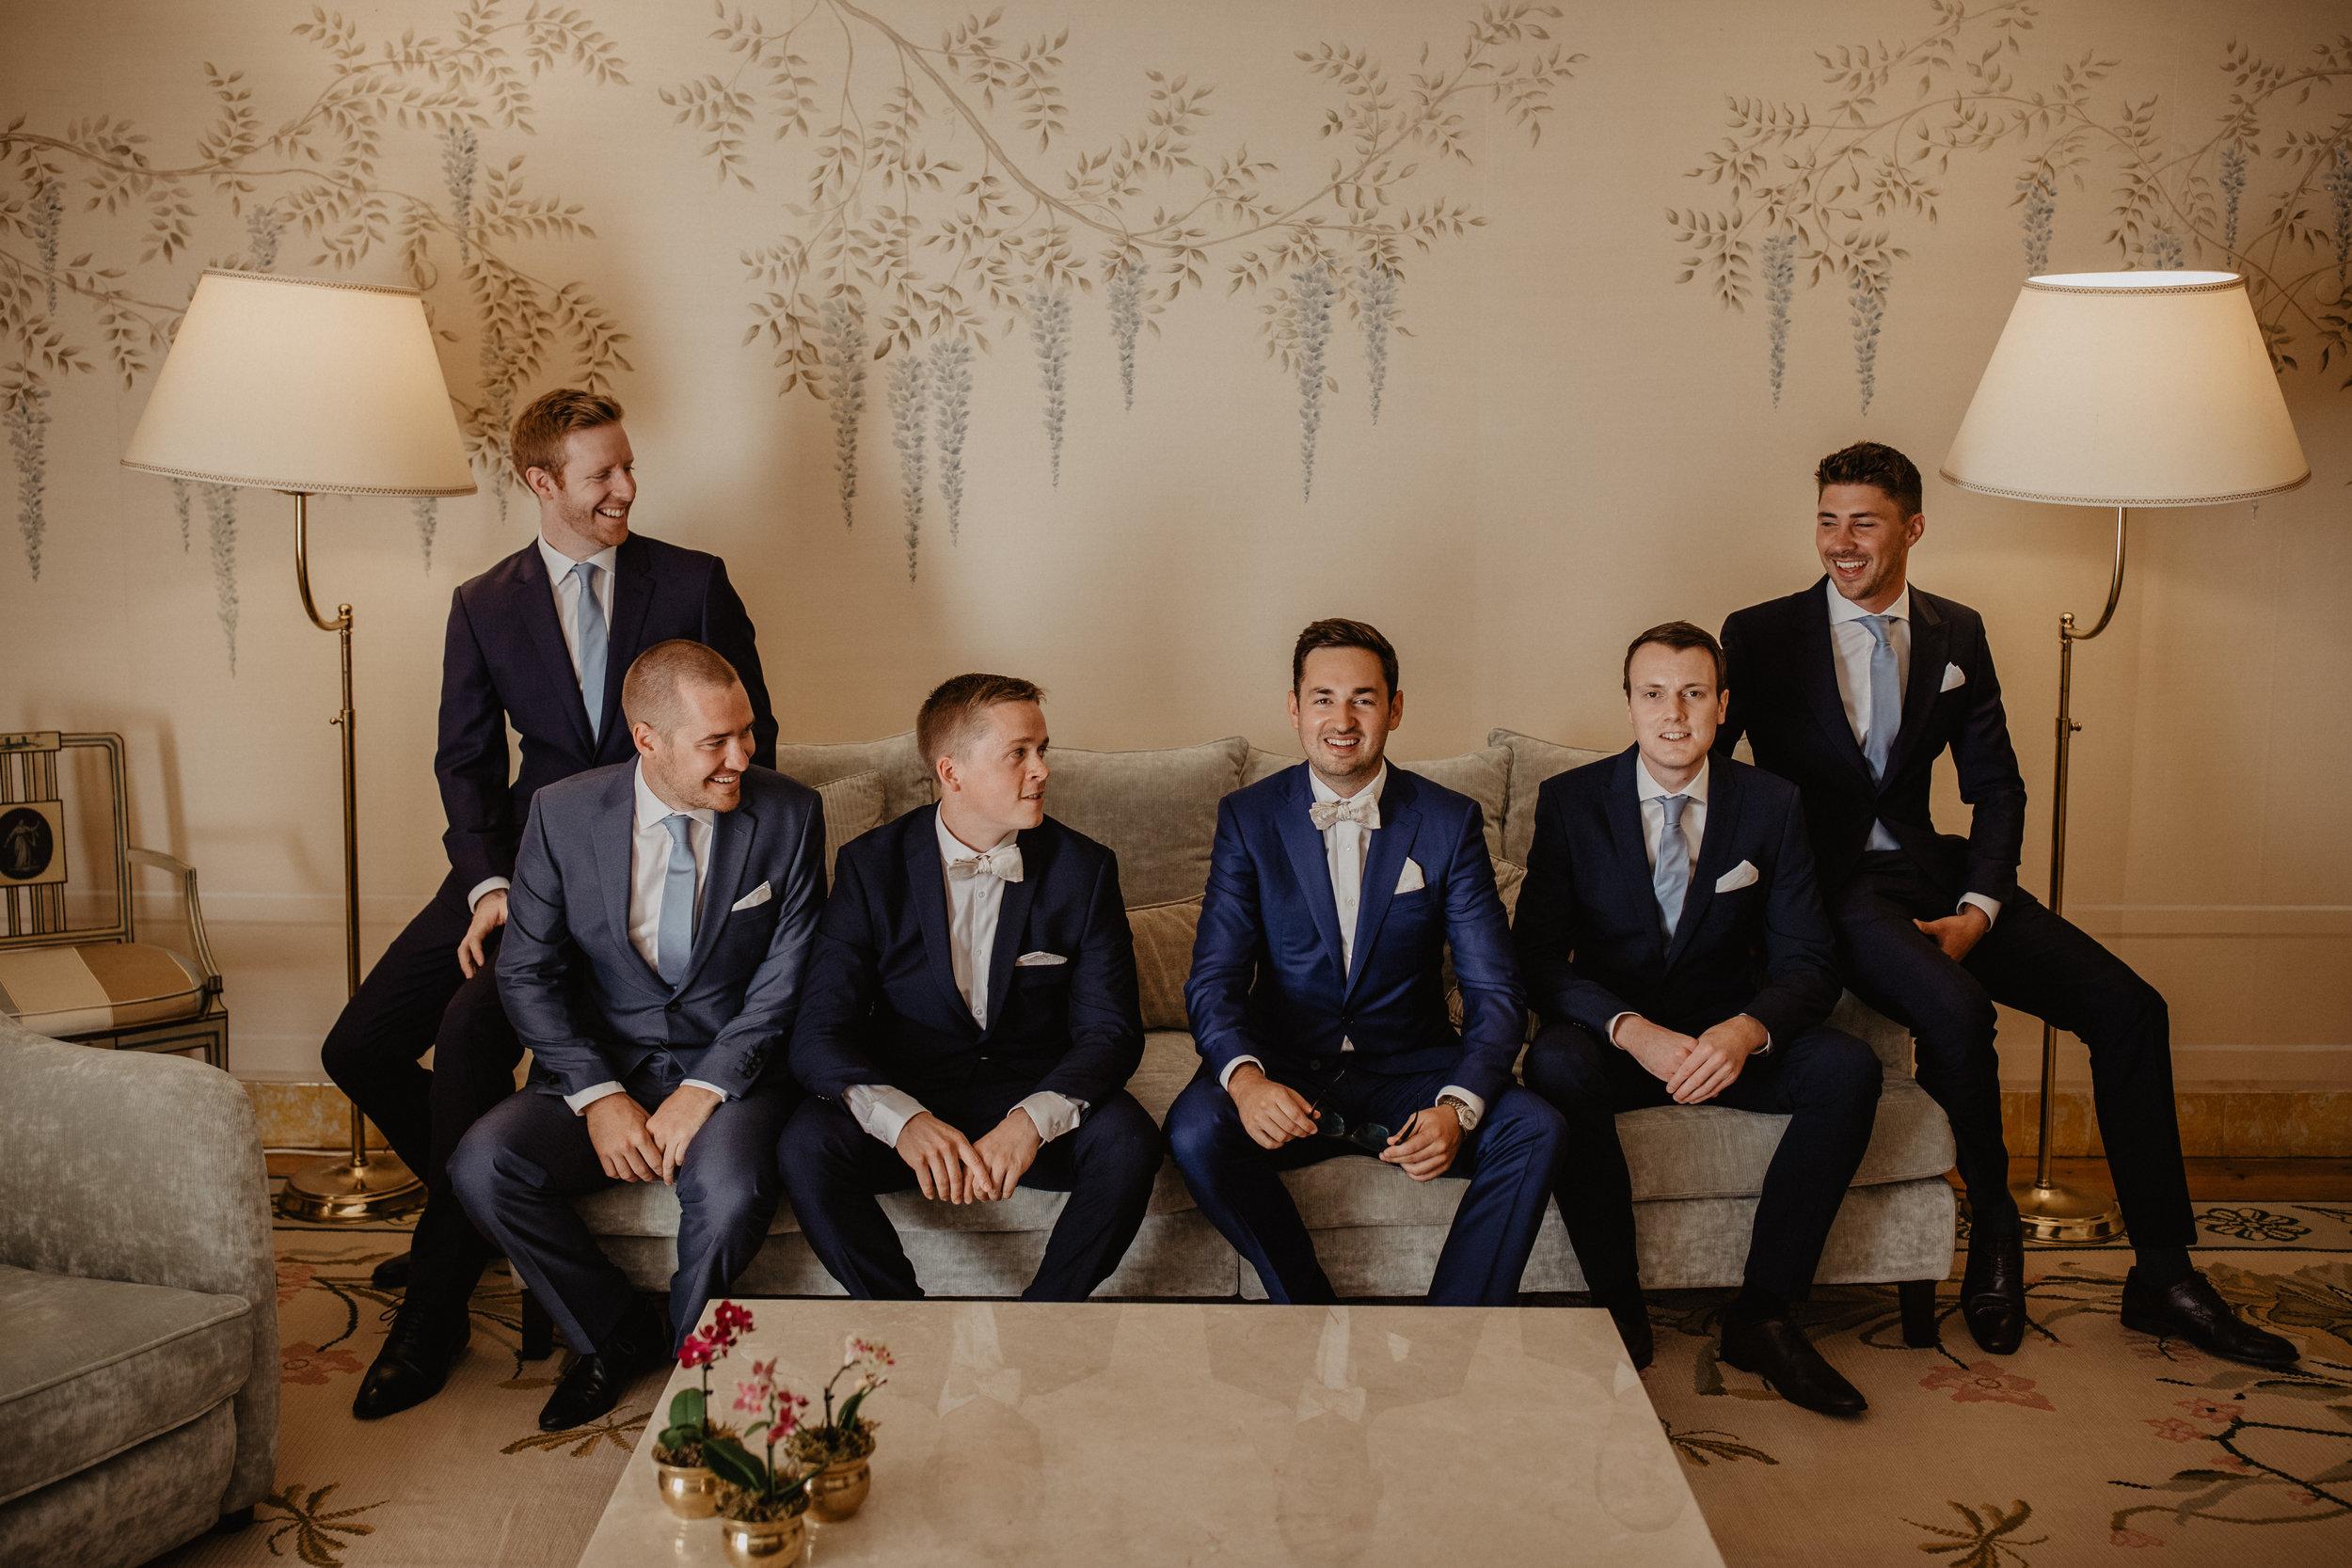 Lapela-photography-wedding-sintra-portugal-11.jpg